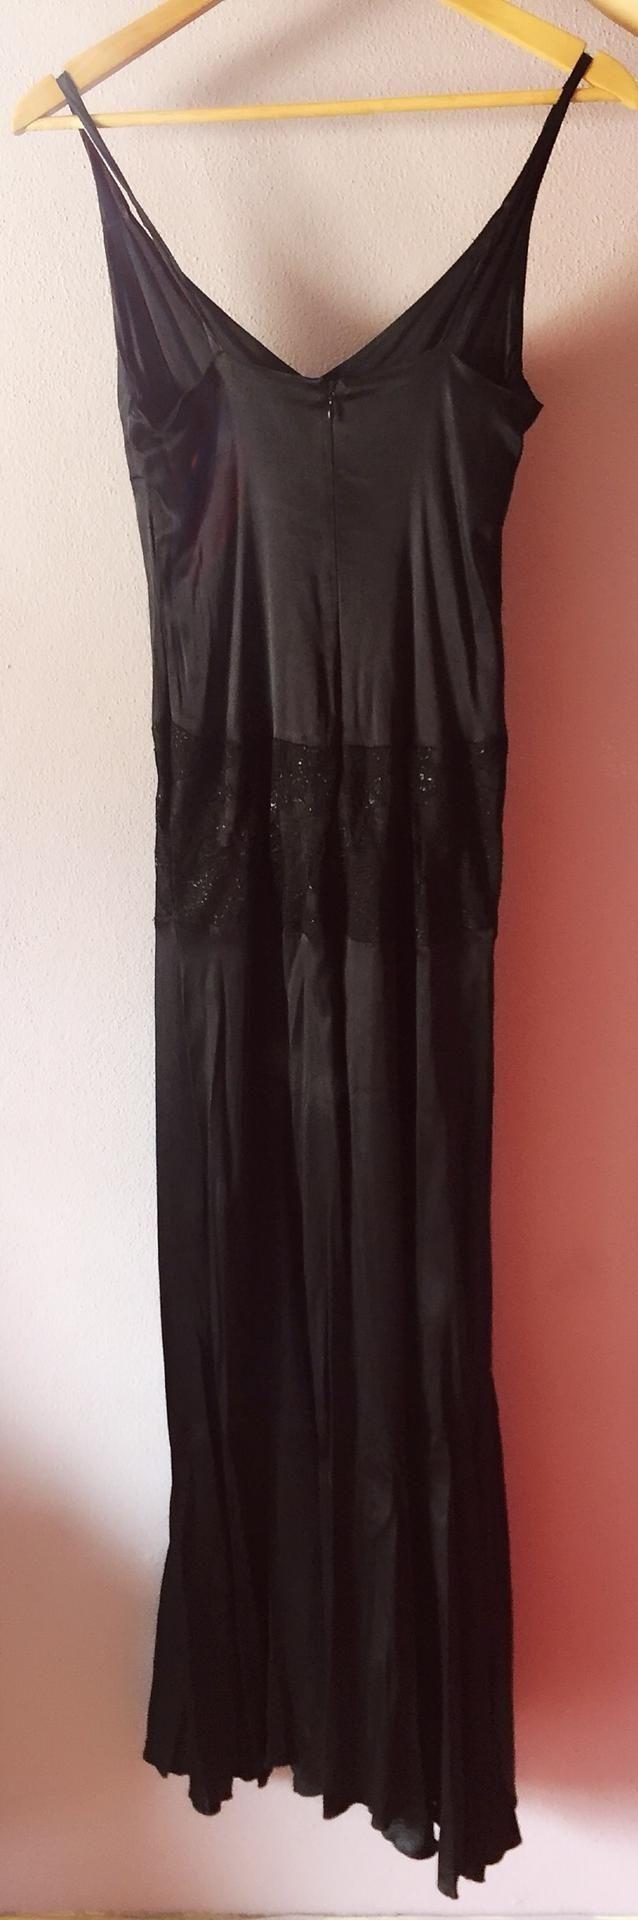 Vestido preto Fátima Lopes